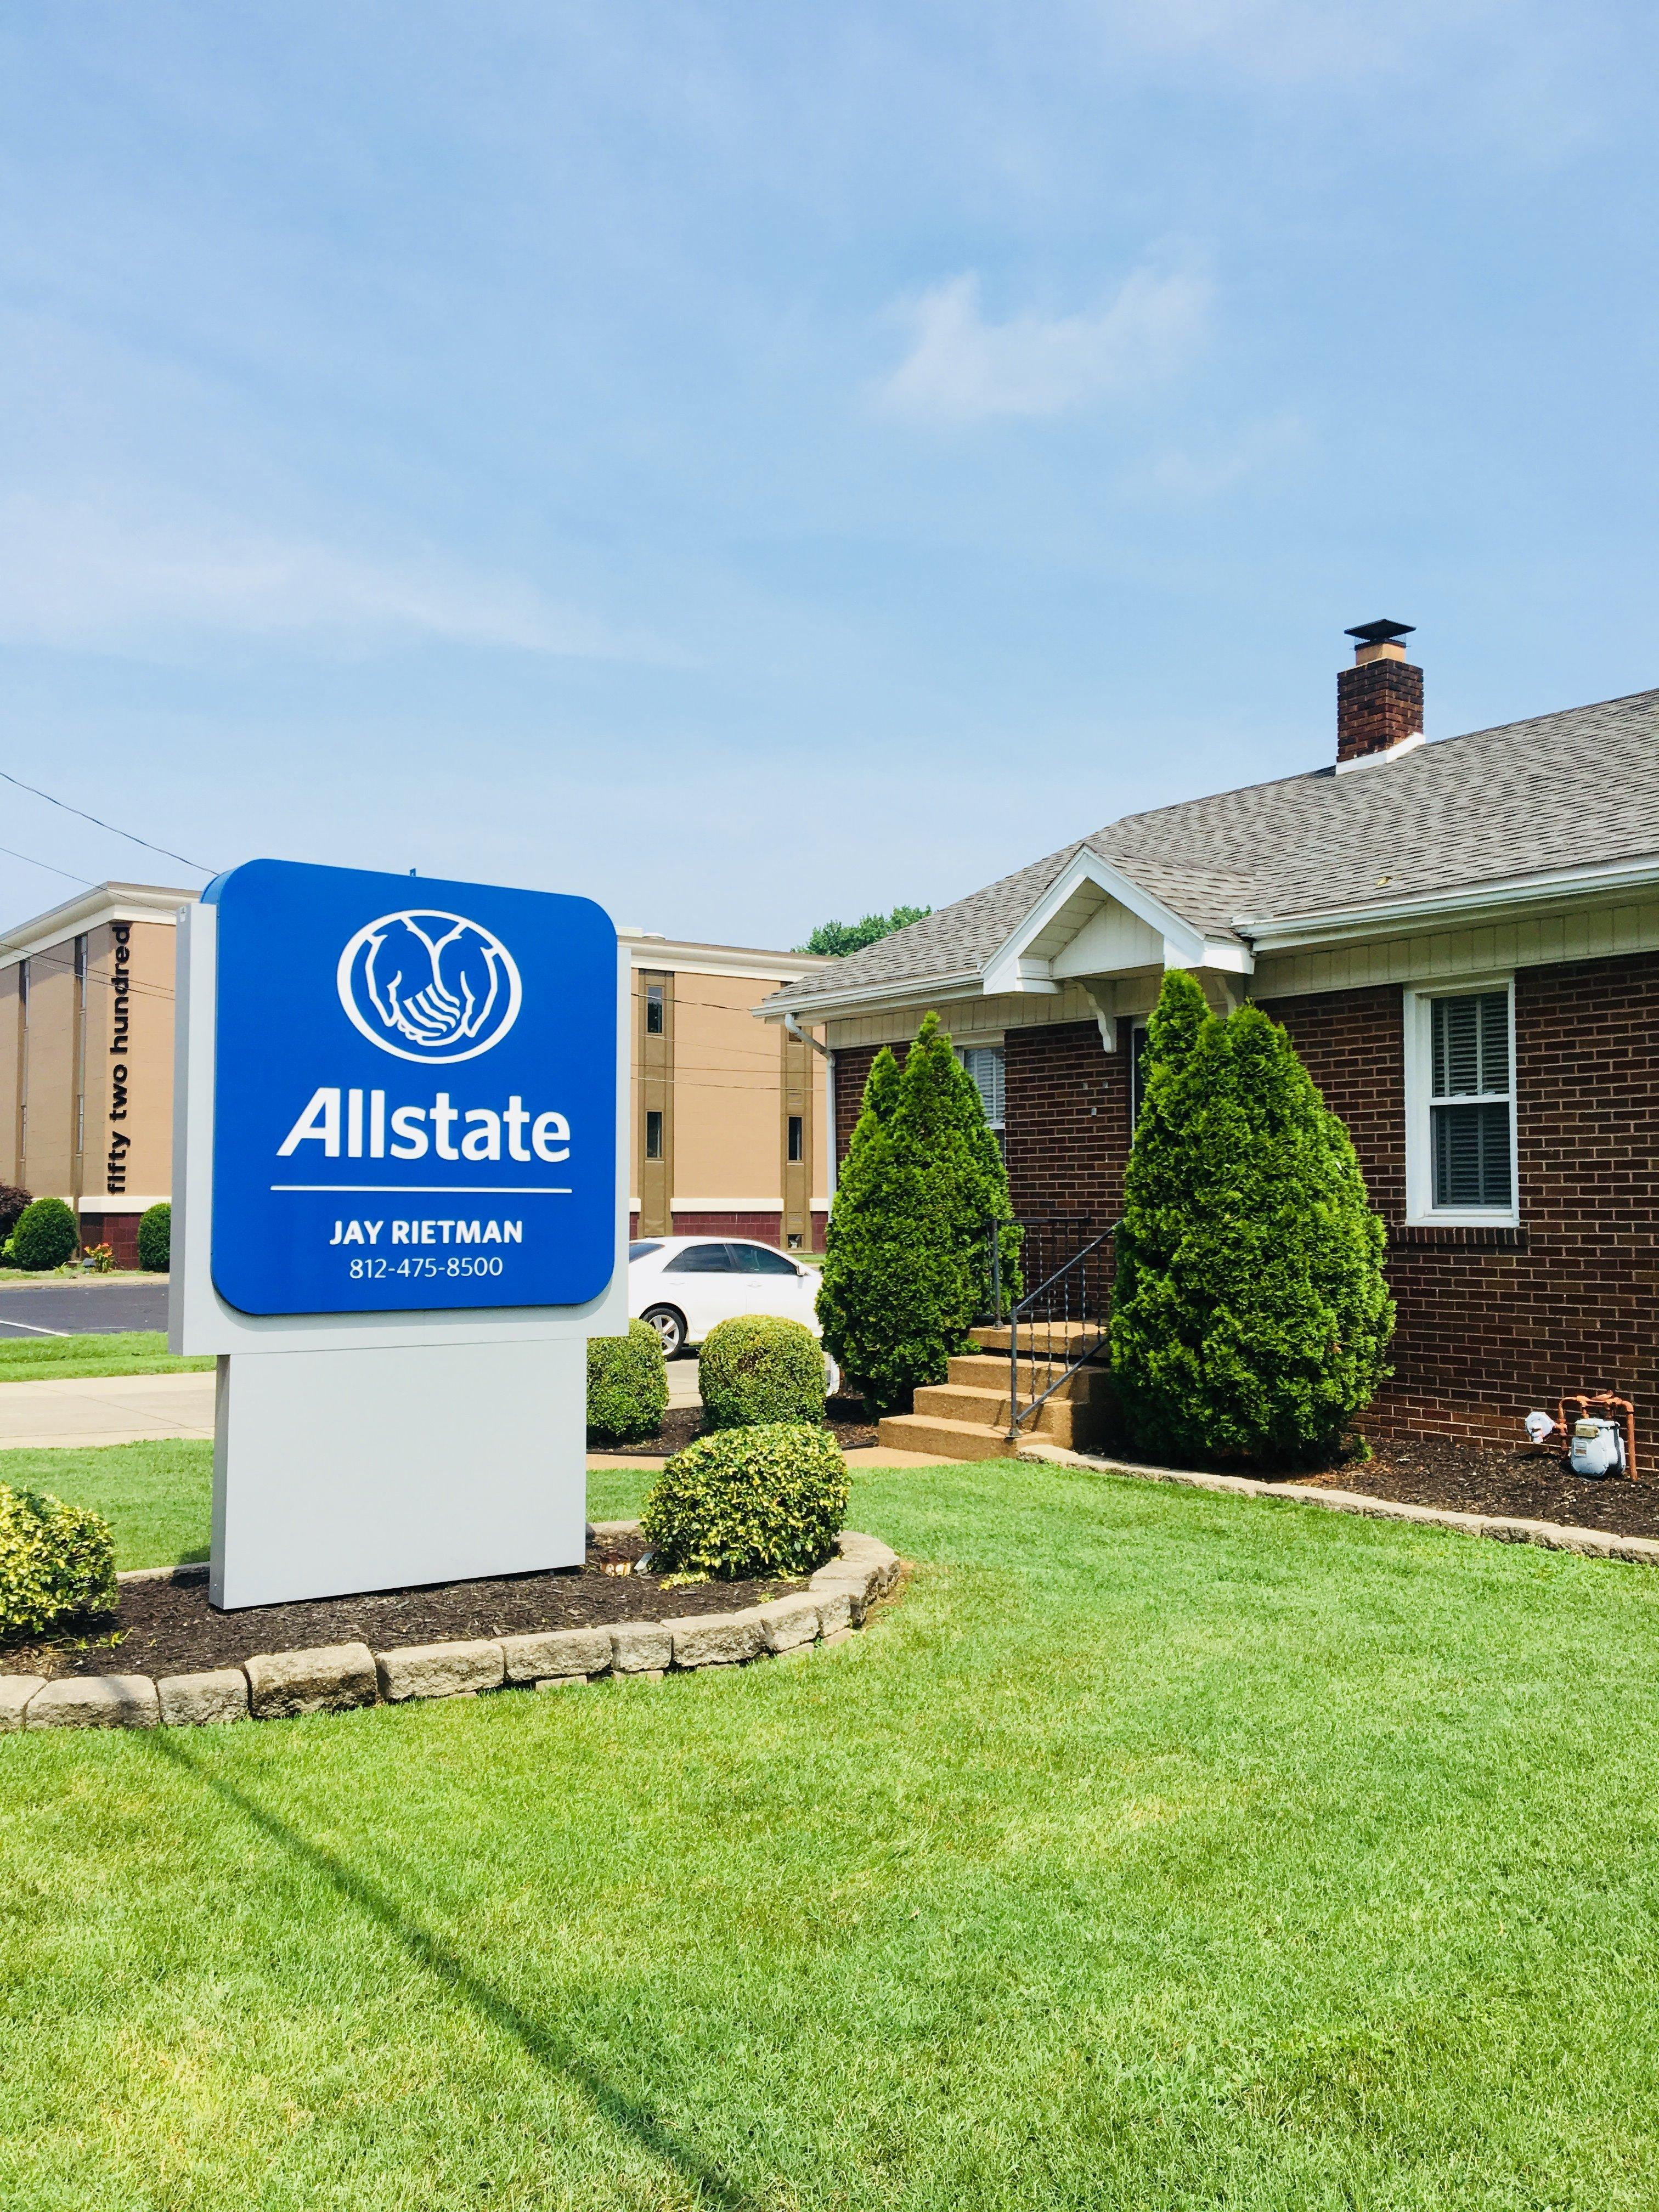 Jay Rietman: Allstate Insurance image 1